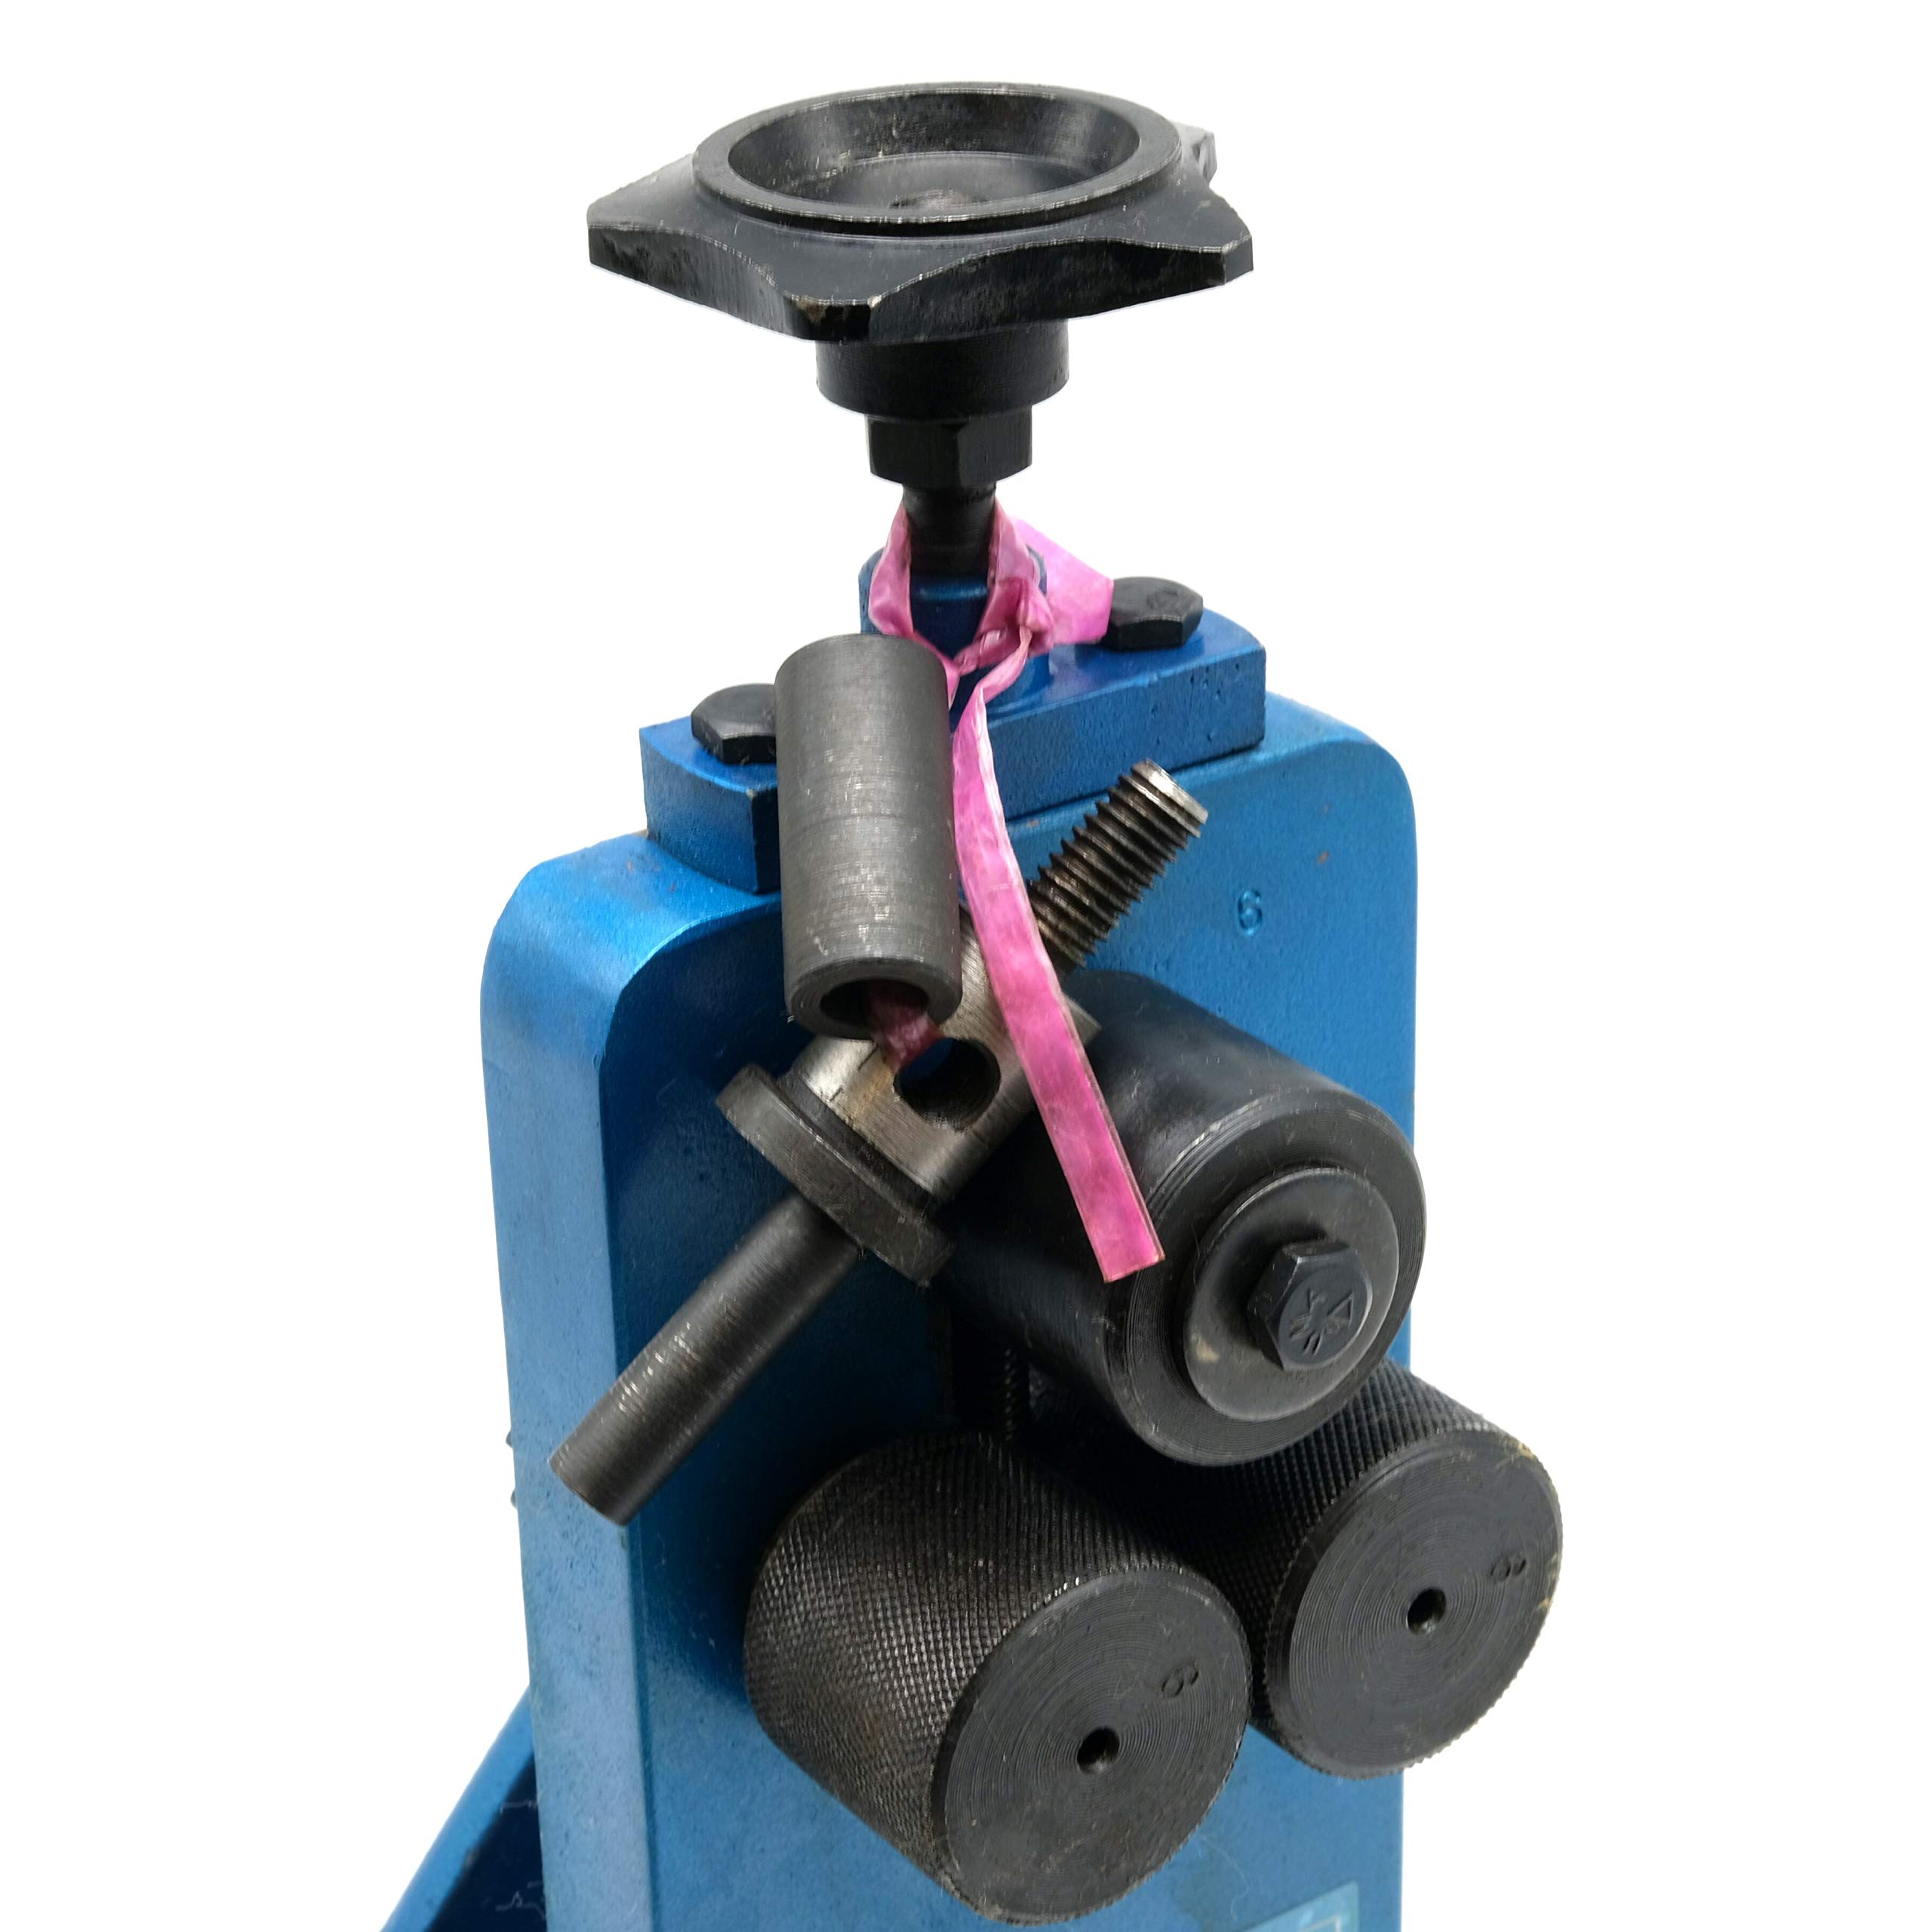 Bangle Ring Machine Jeweler Metal Forming Rounding Tool by Generic (Image #3)